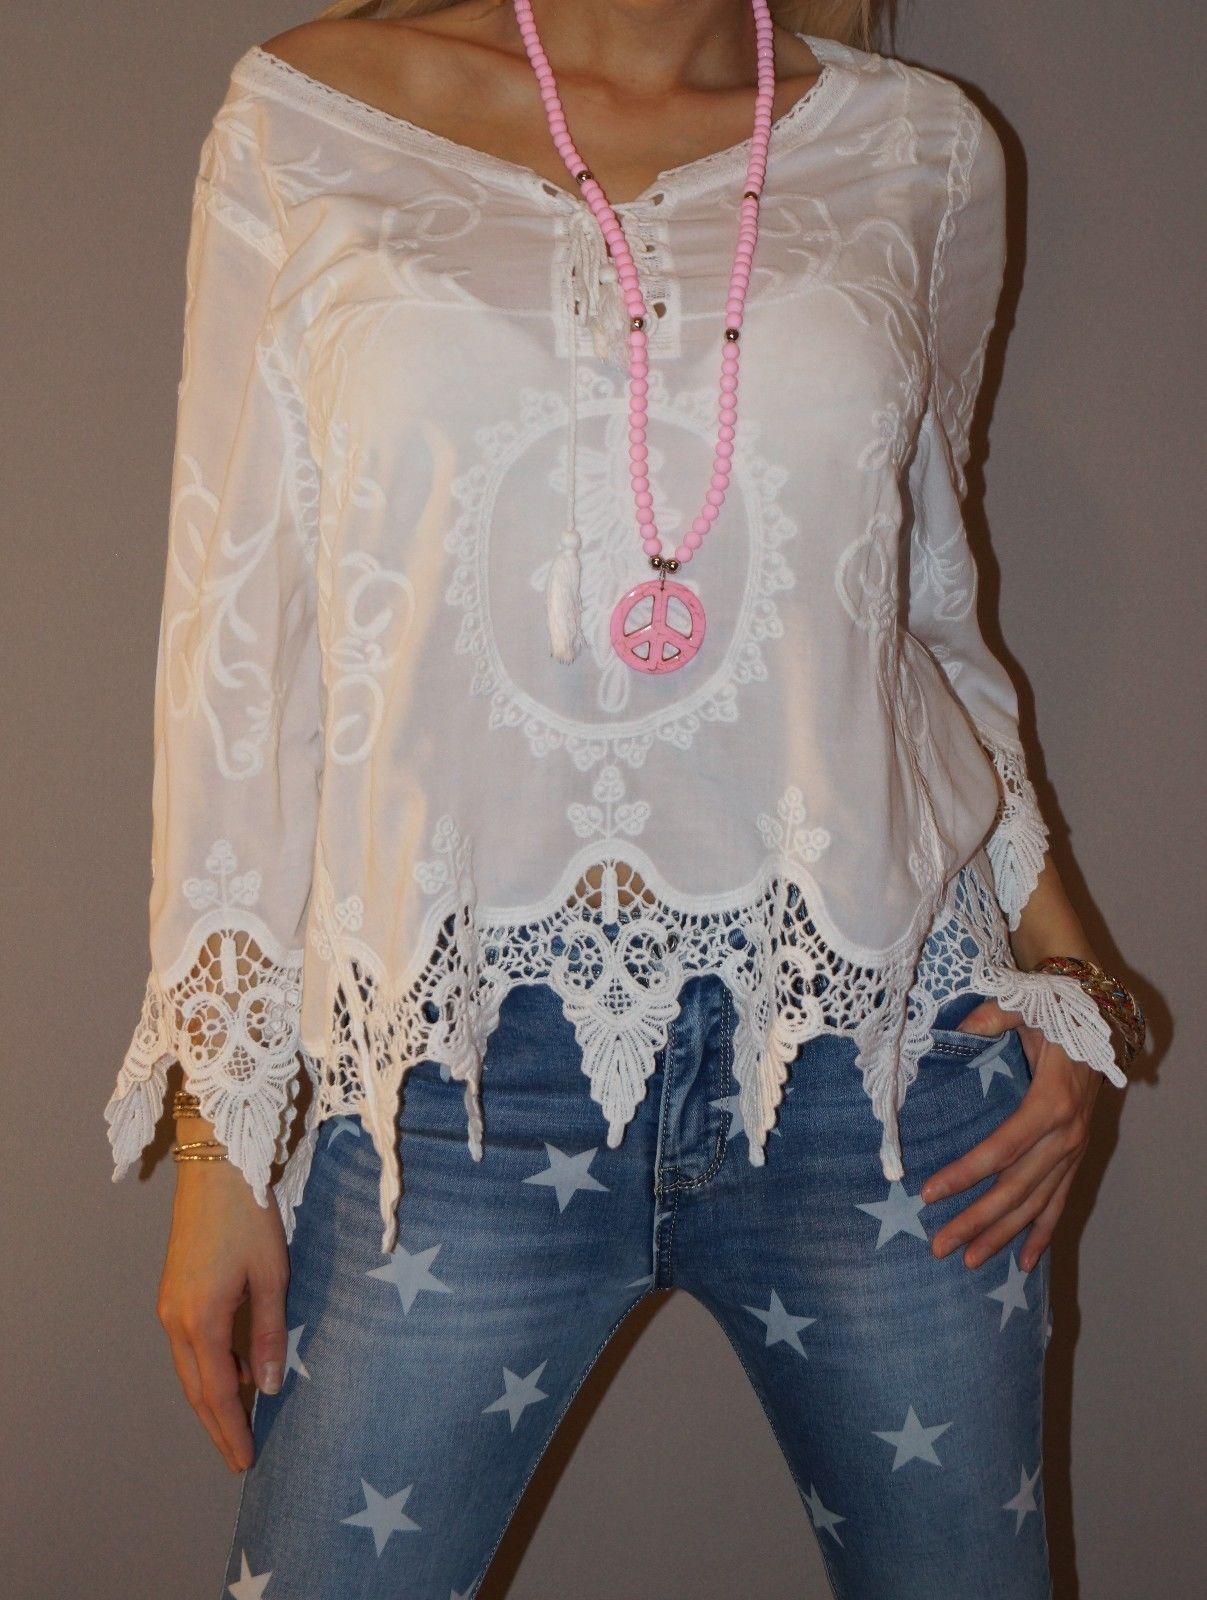 NEU Häkel Tunika Hippie Sexy Bluse Blogger Shirt Kurz S 36-40 M Weiß Trend